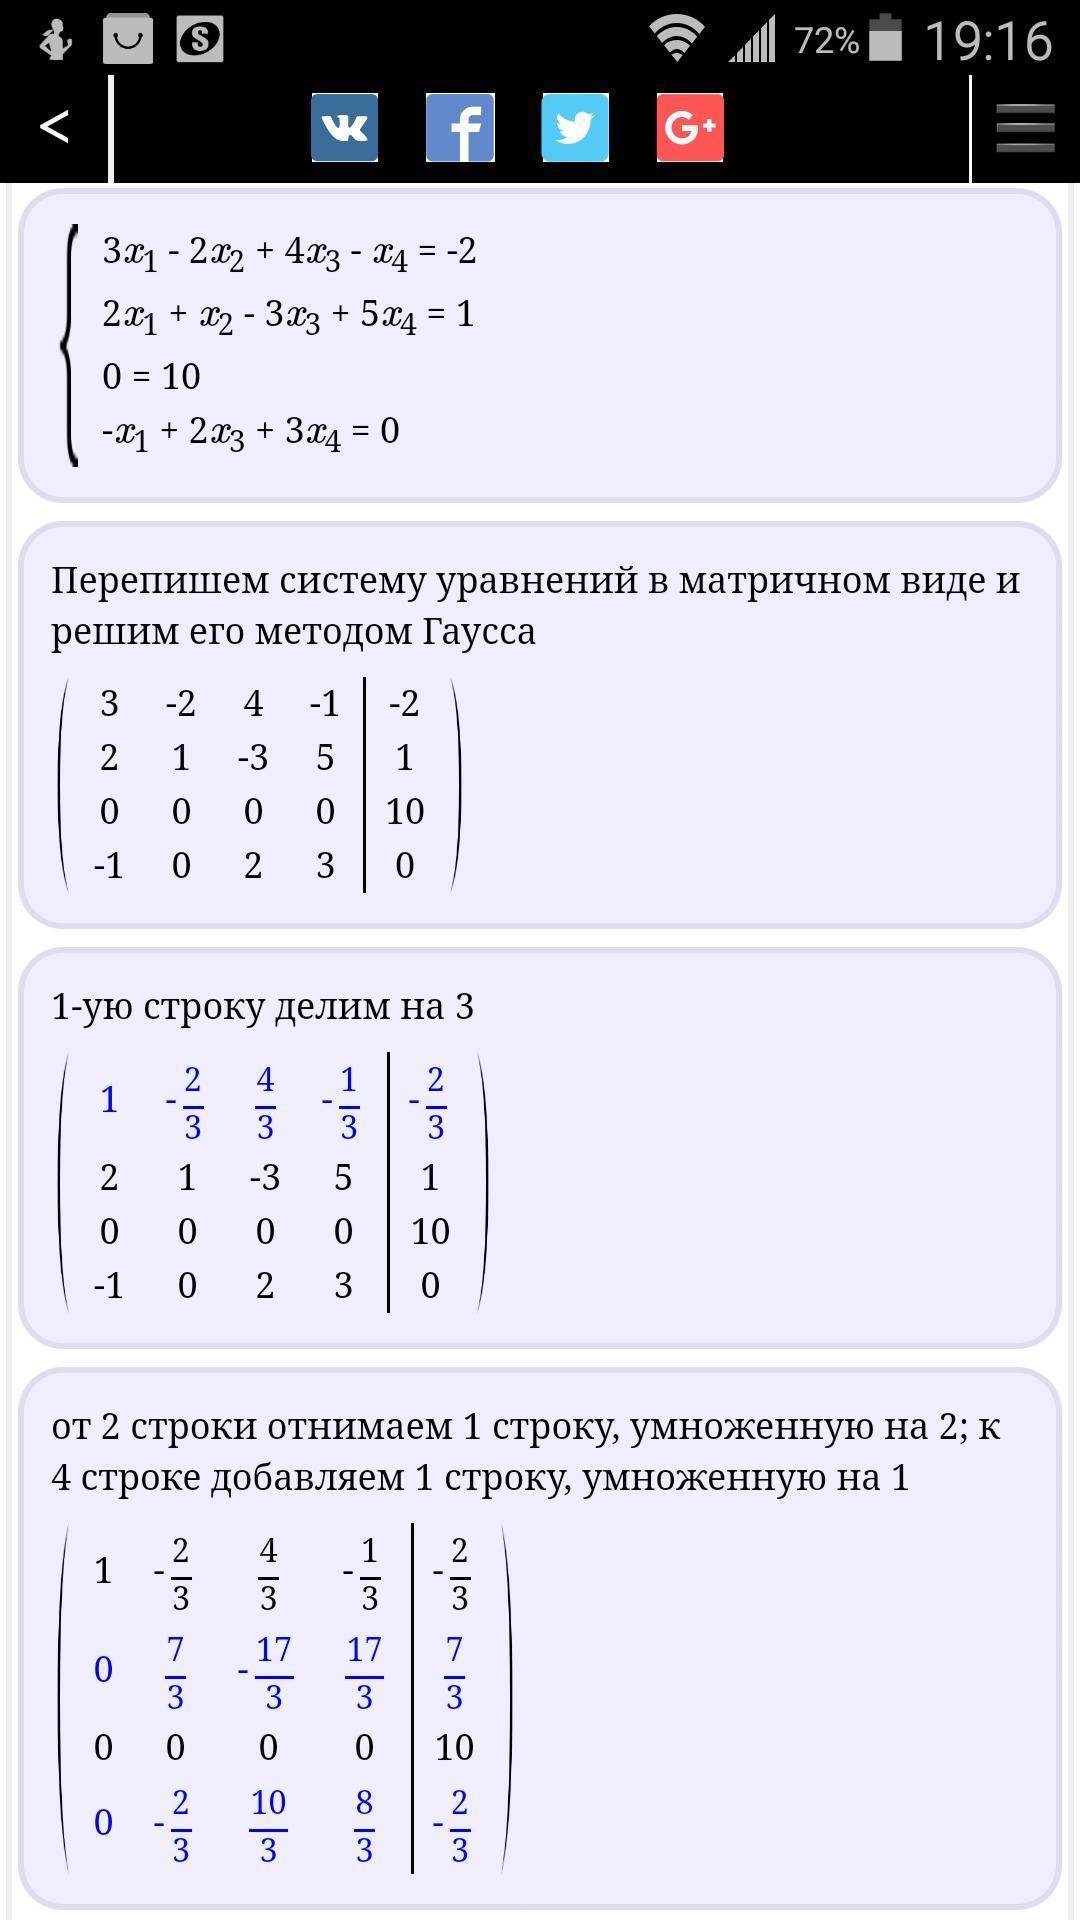 C блок схема матрицы